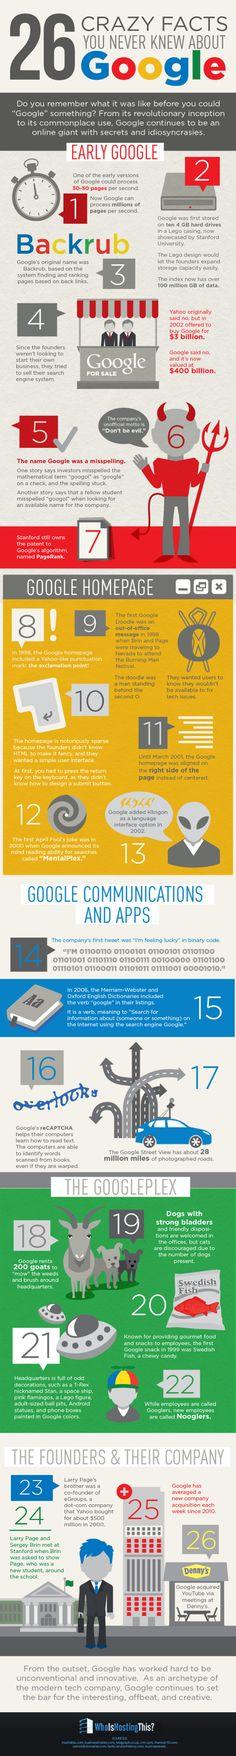 26-Crazy-Google-Facts